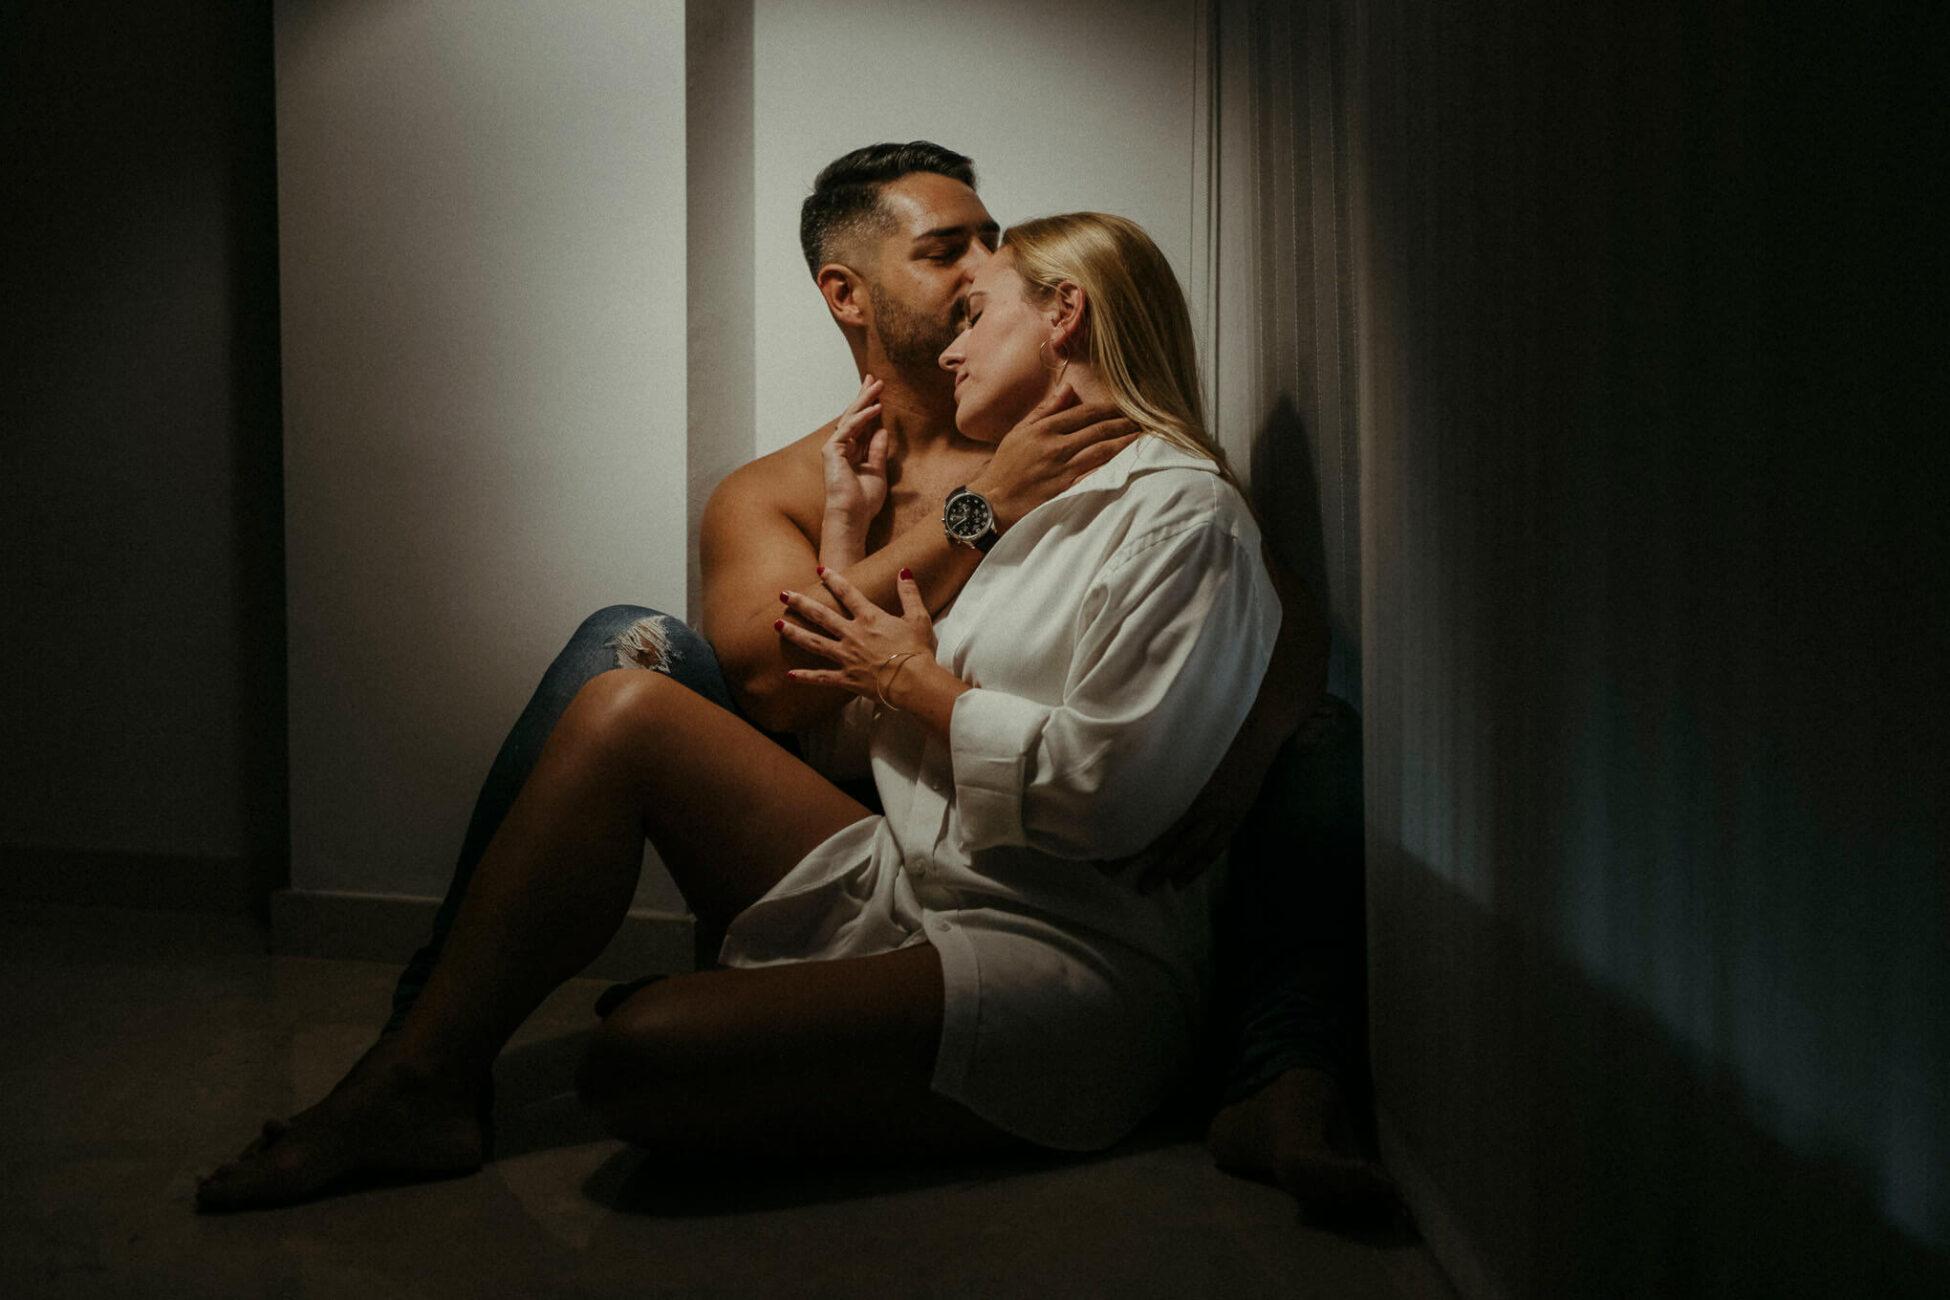 el mejor fotógrafo de reportajes de pareja en Valencia